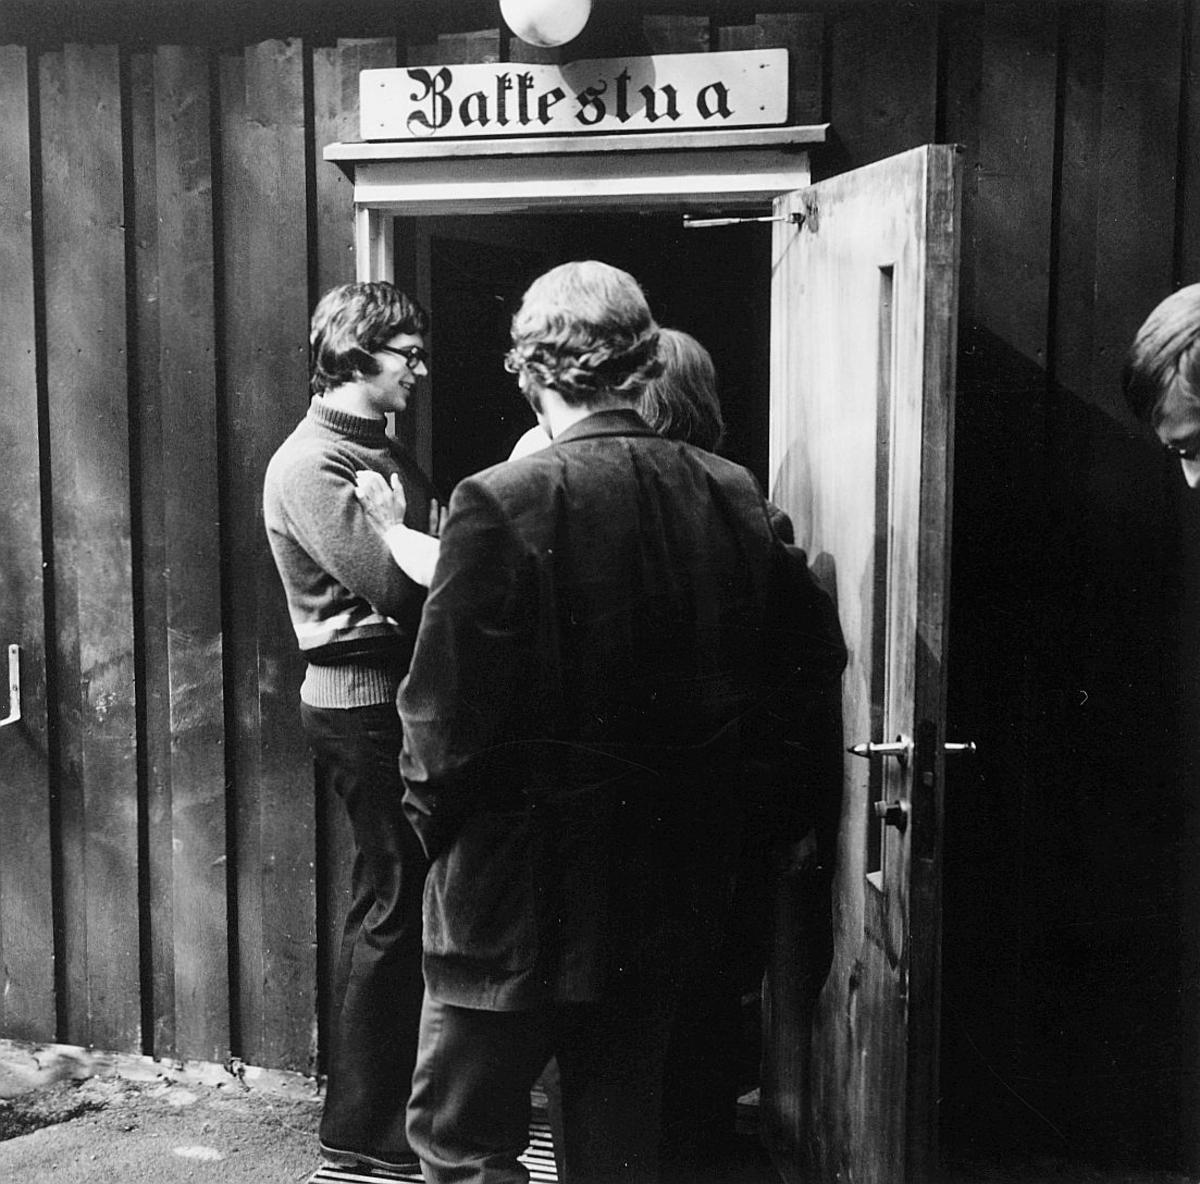 postskolen, Sjøstrand bad, april 1974, inngangspartiet, kaffestua, 3 menn